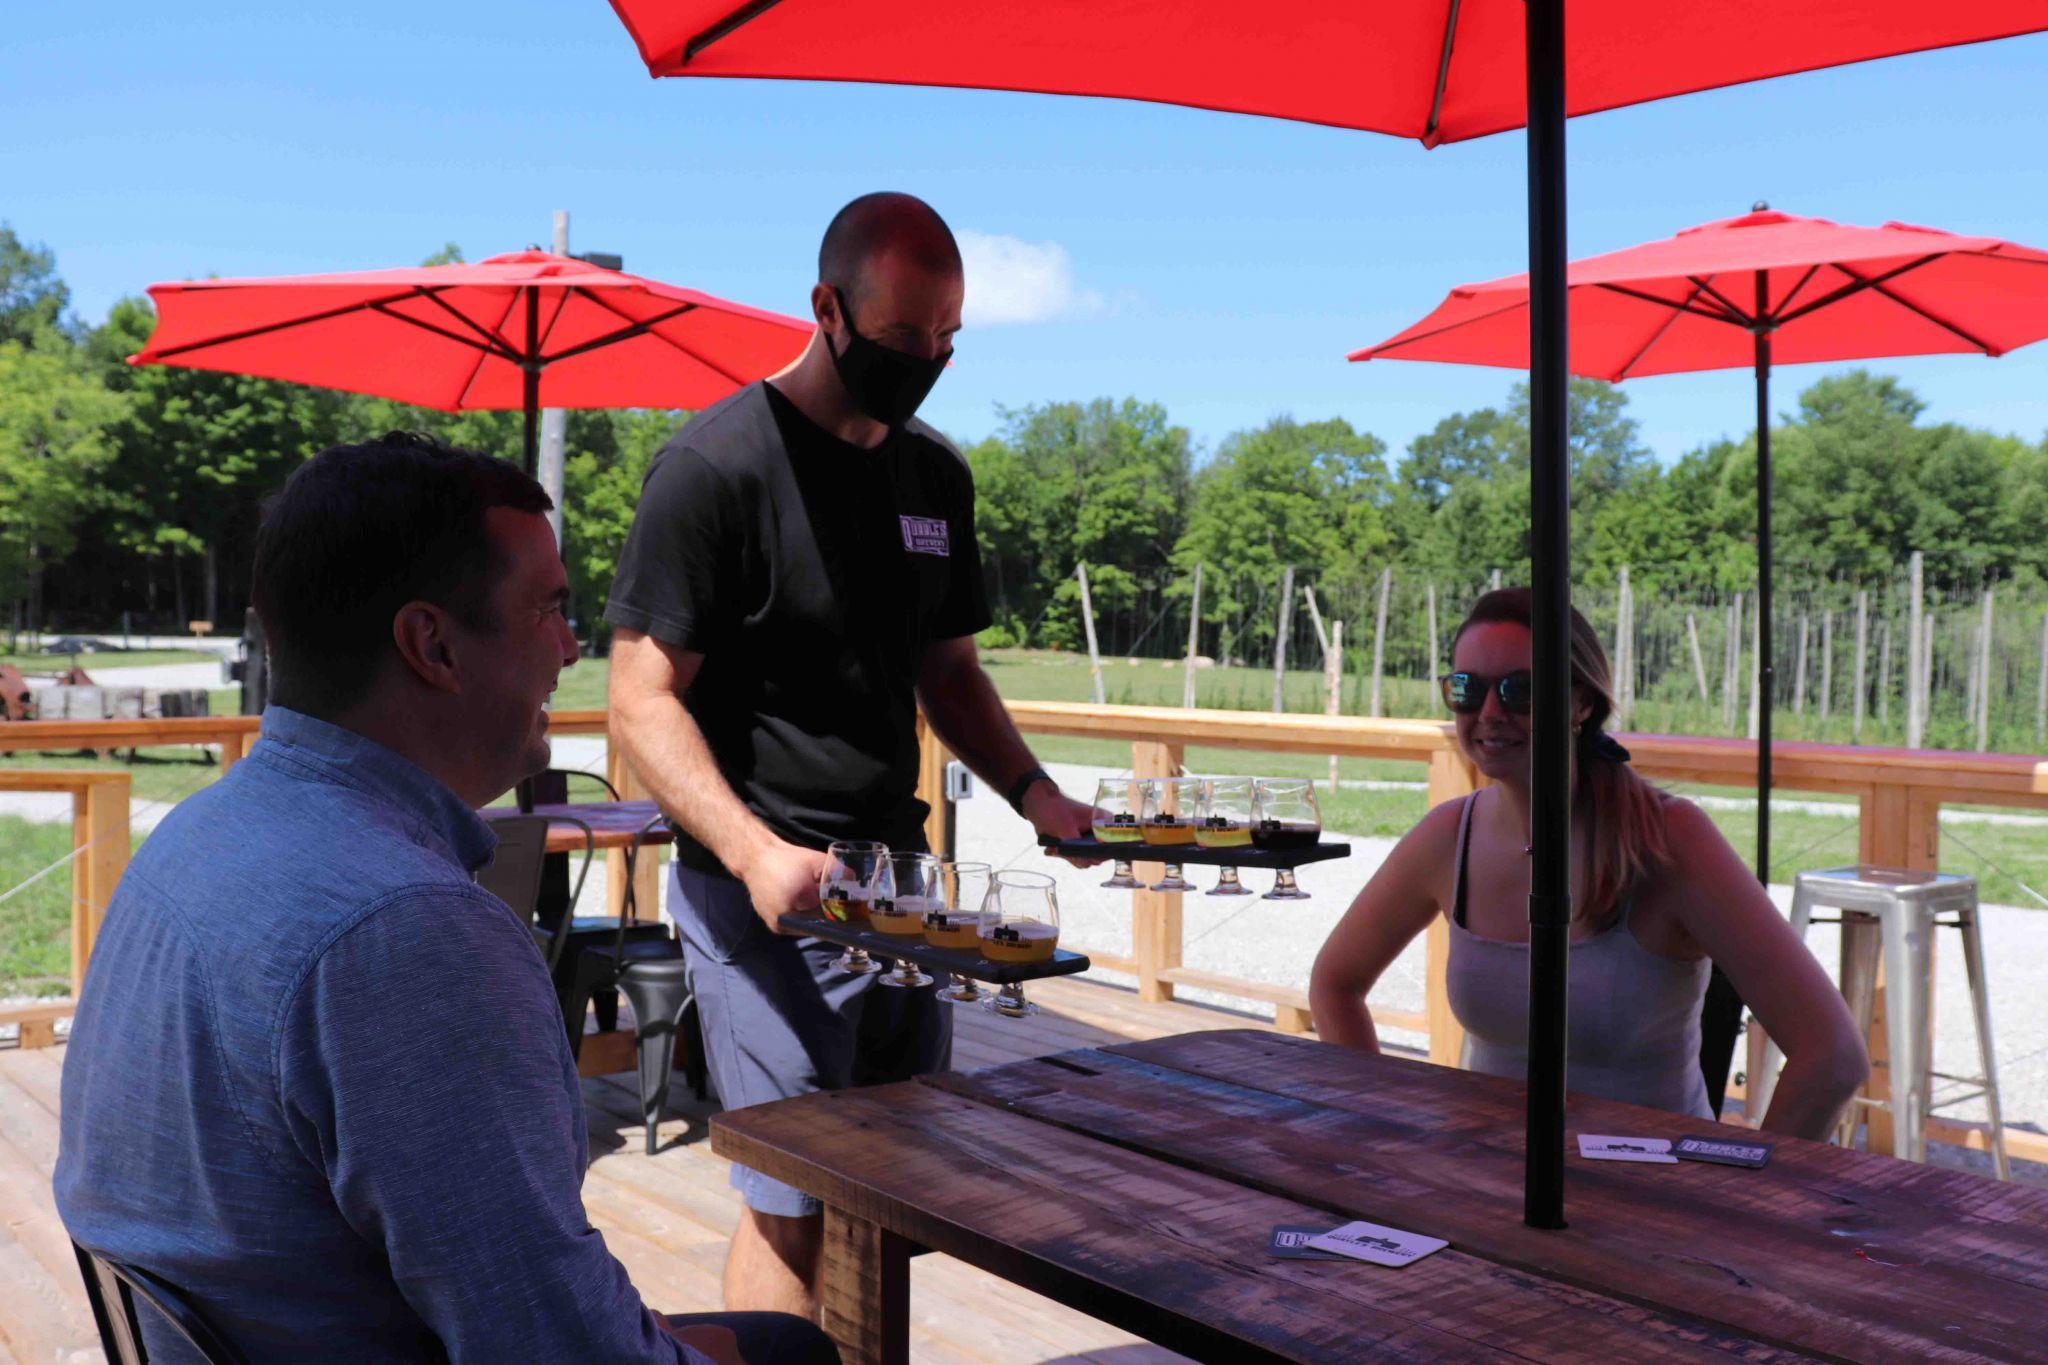 Quayles Brewery5 - Tourism Spotlight: Quayle's Brewery